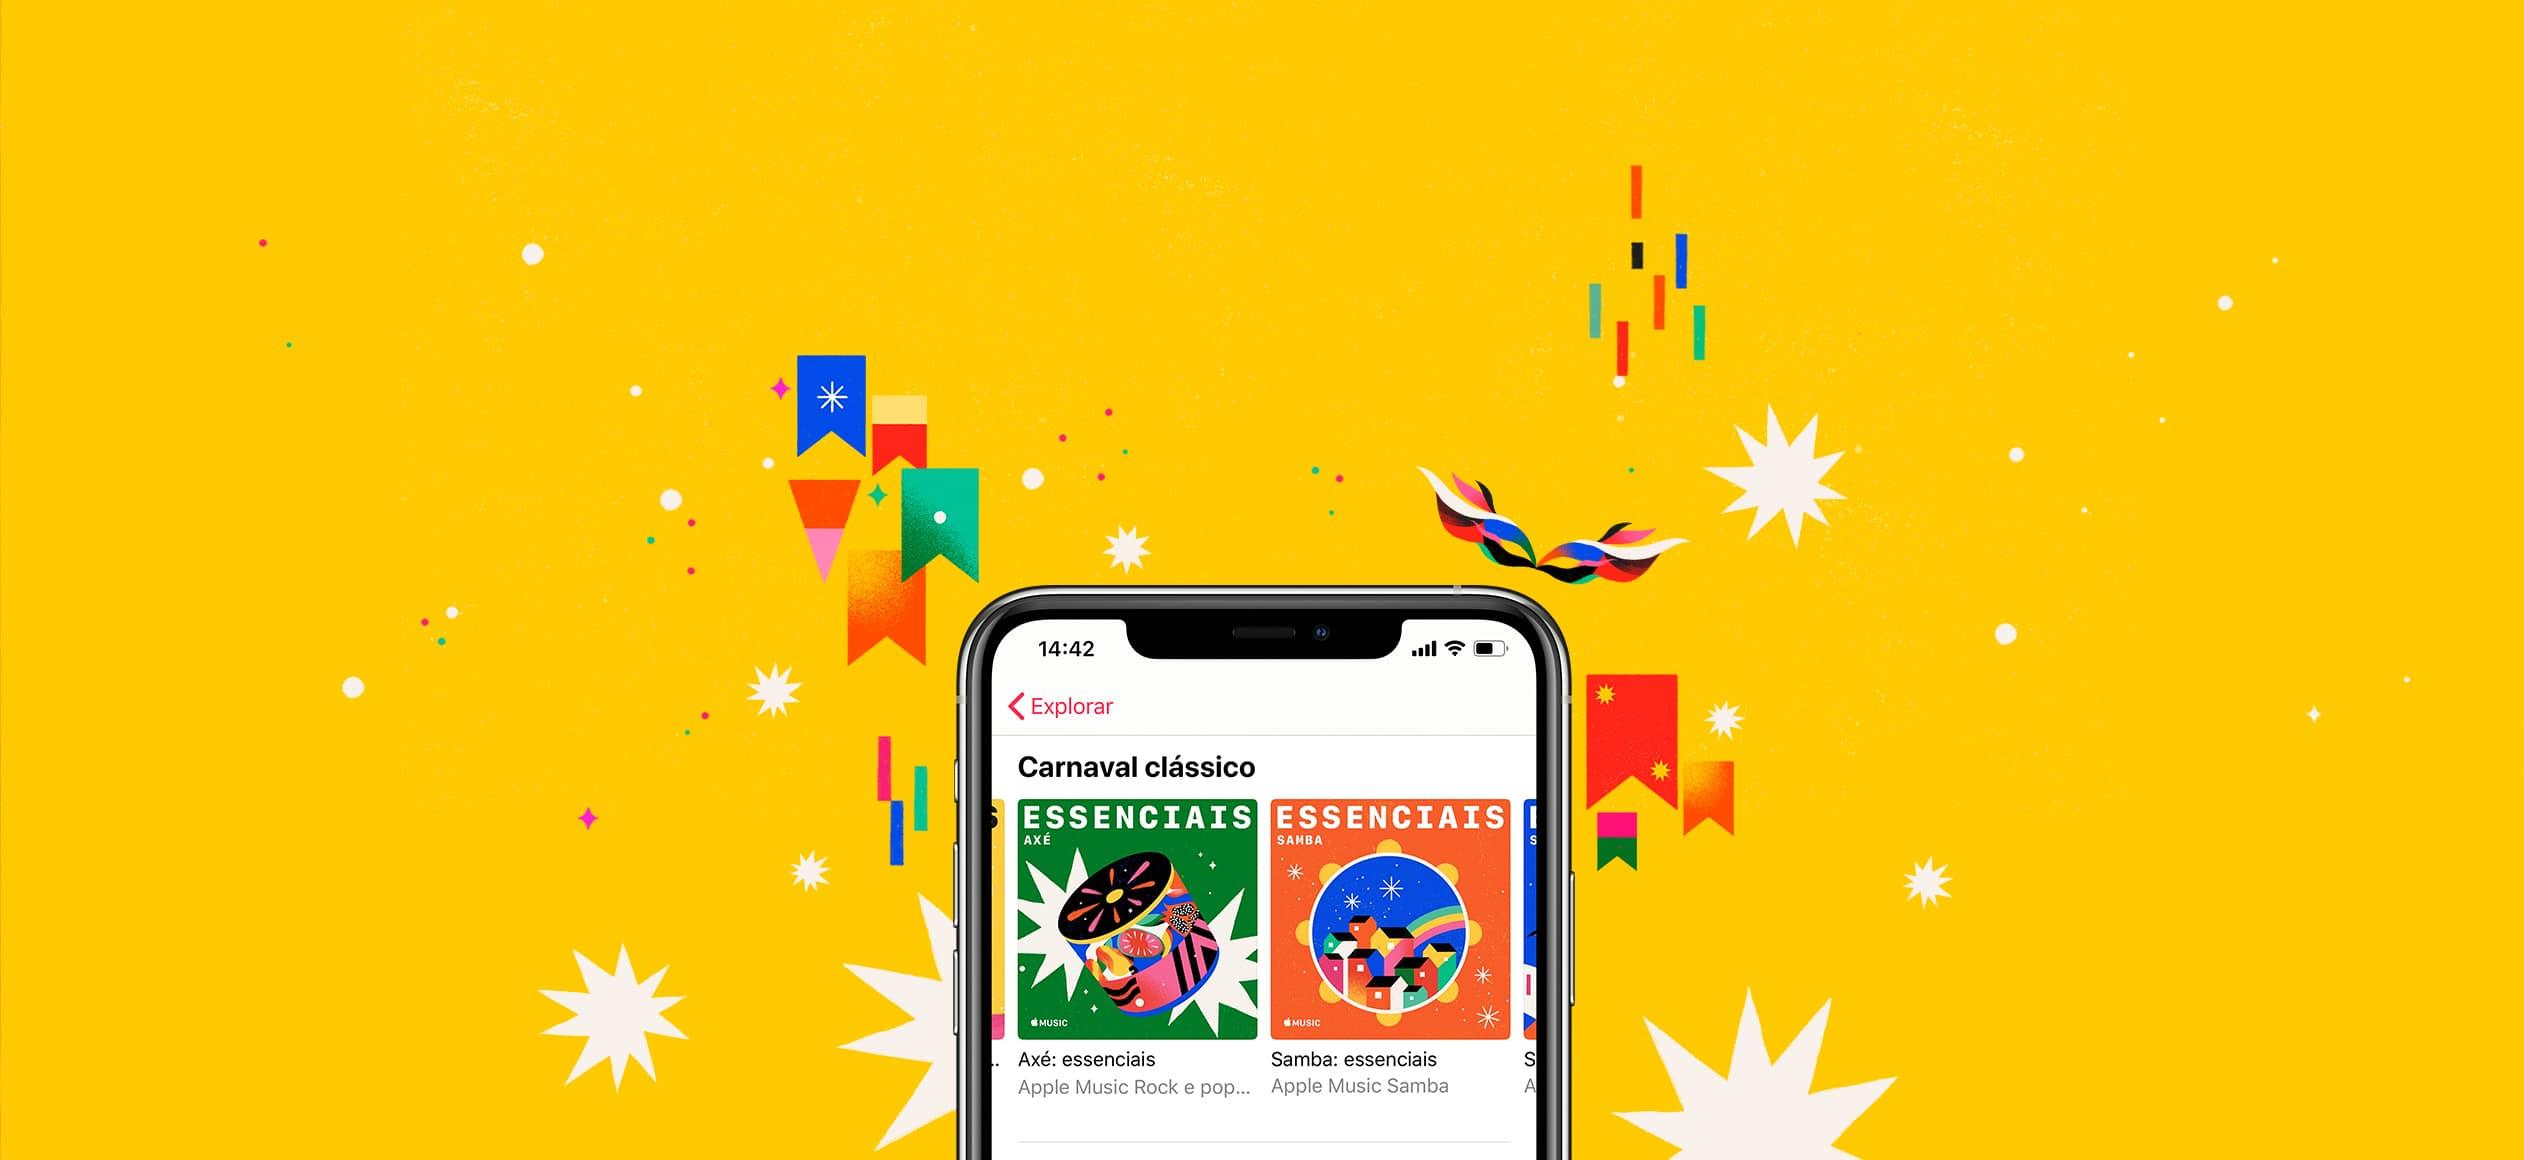 Apple Music no Carnaval 2020